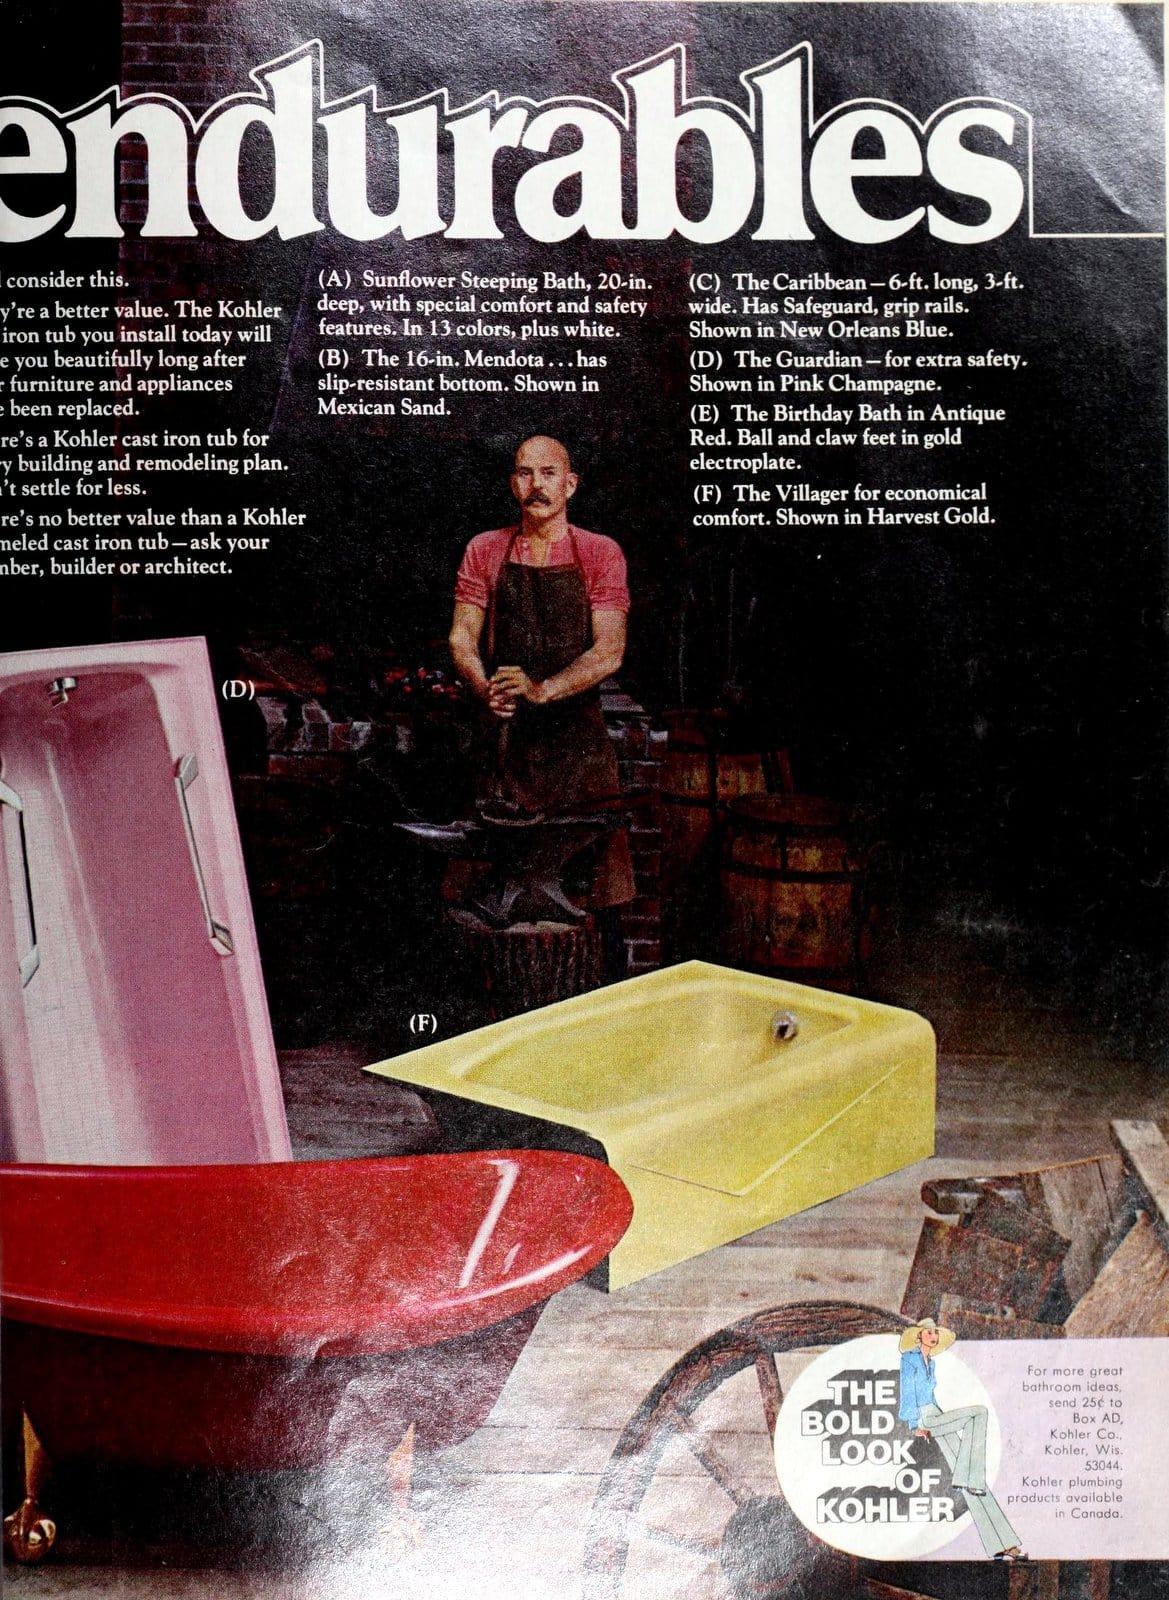 Bathroom fixtures - enameled cast iron KohlerEndurables from 1975 (1)